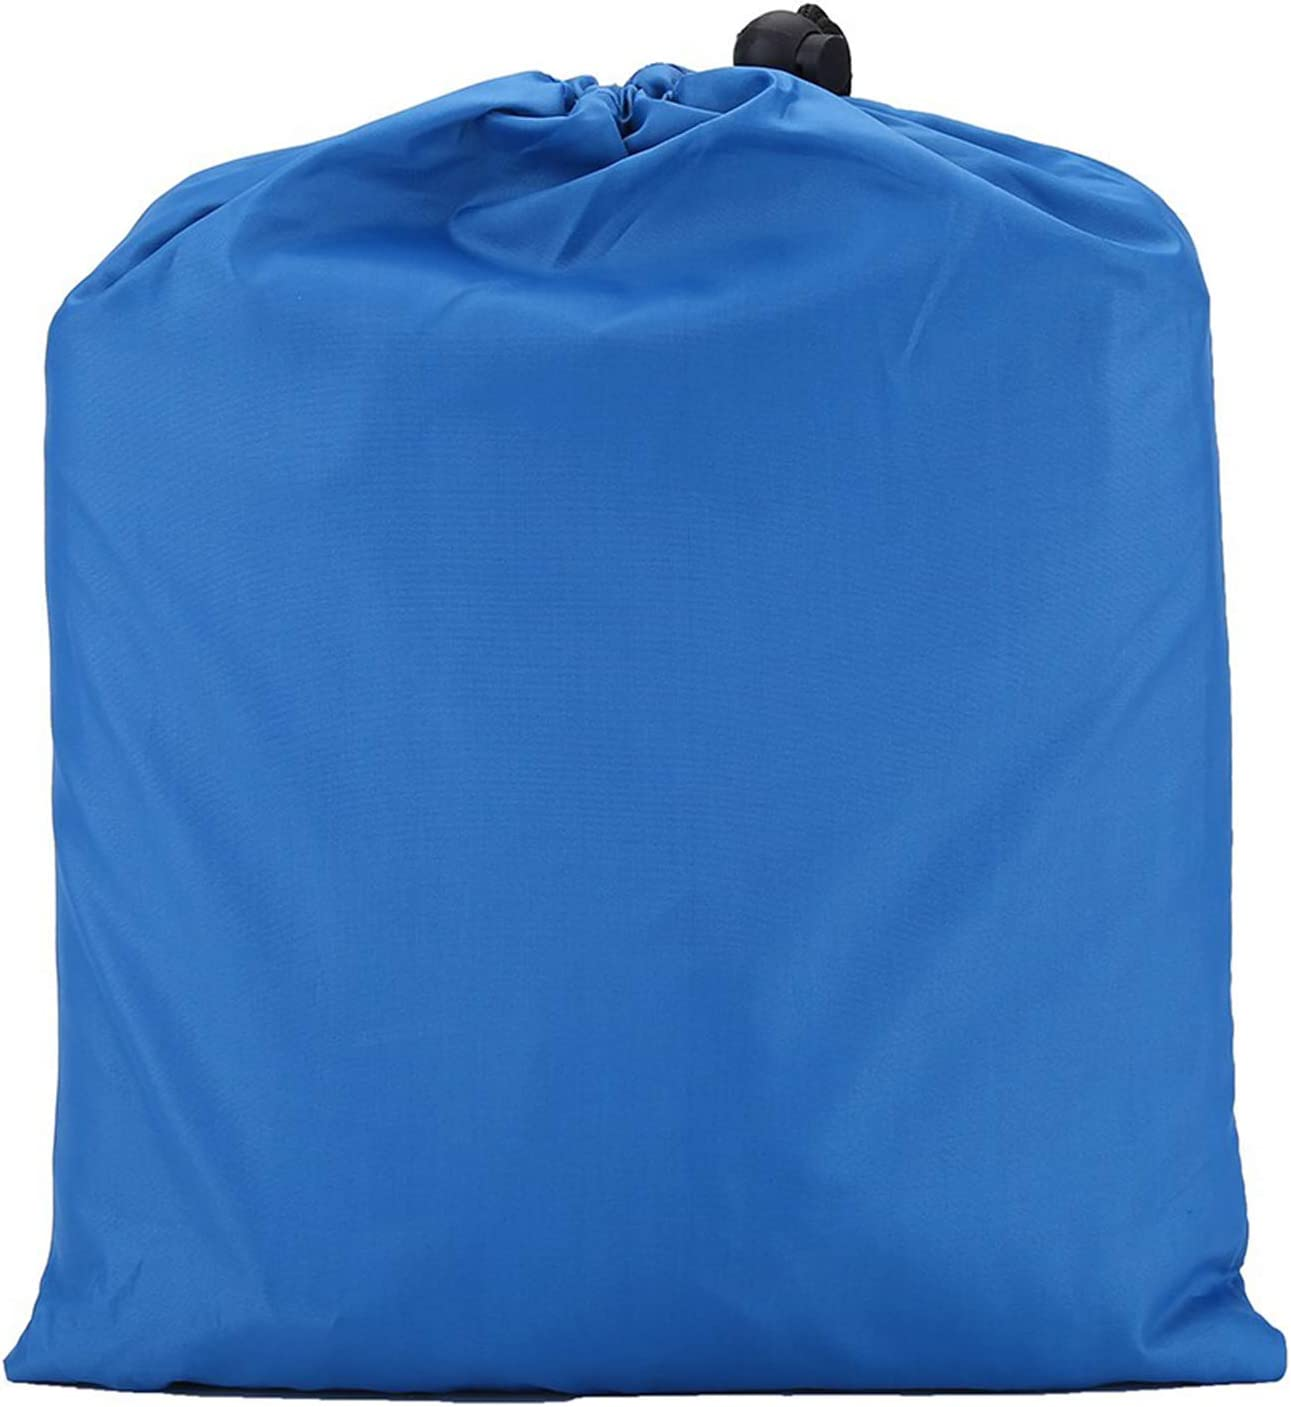 Kuuleyn Luxury Hammock Max 68% OFF Camping Tarp Shelter Tent Portable Outdoor